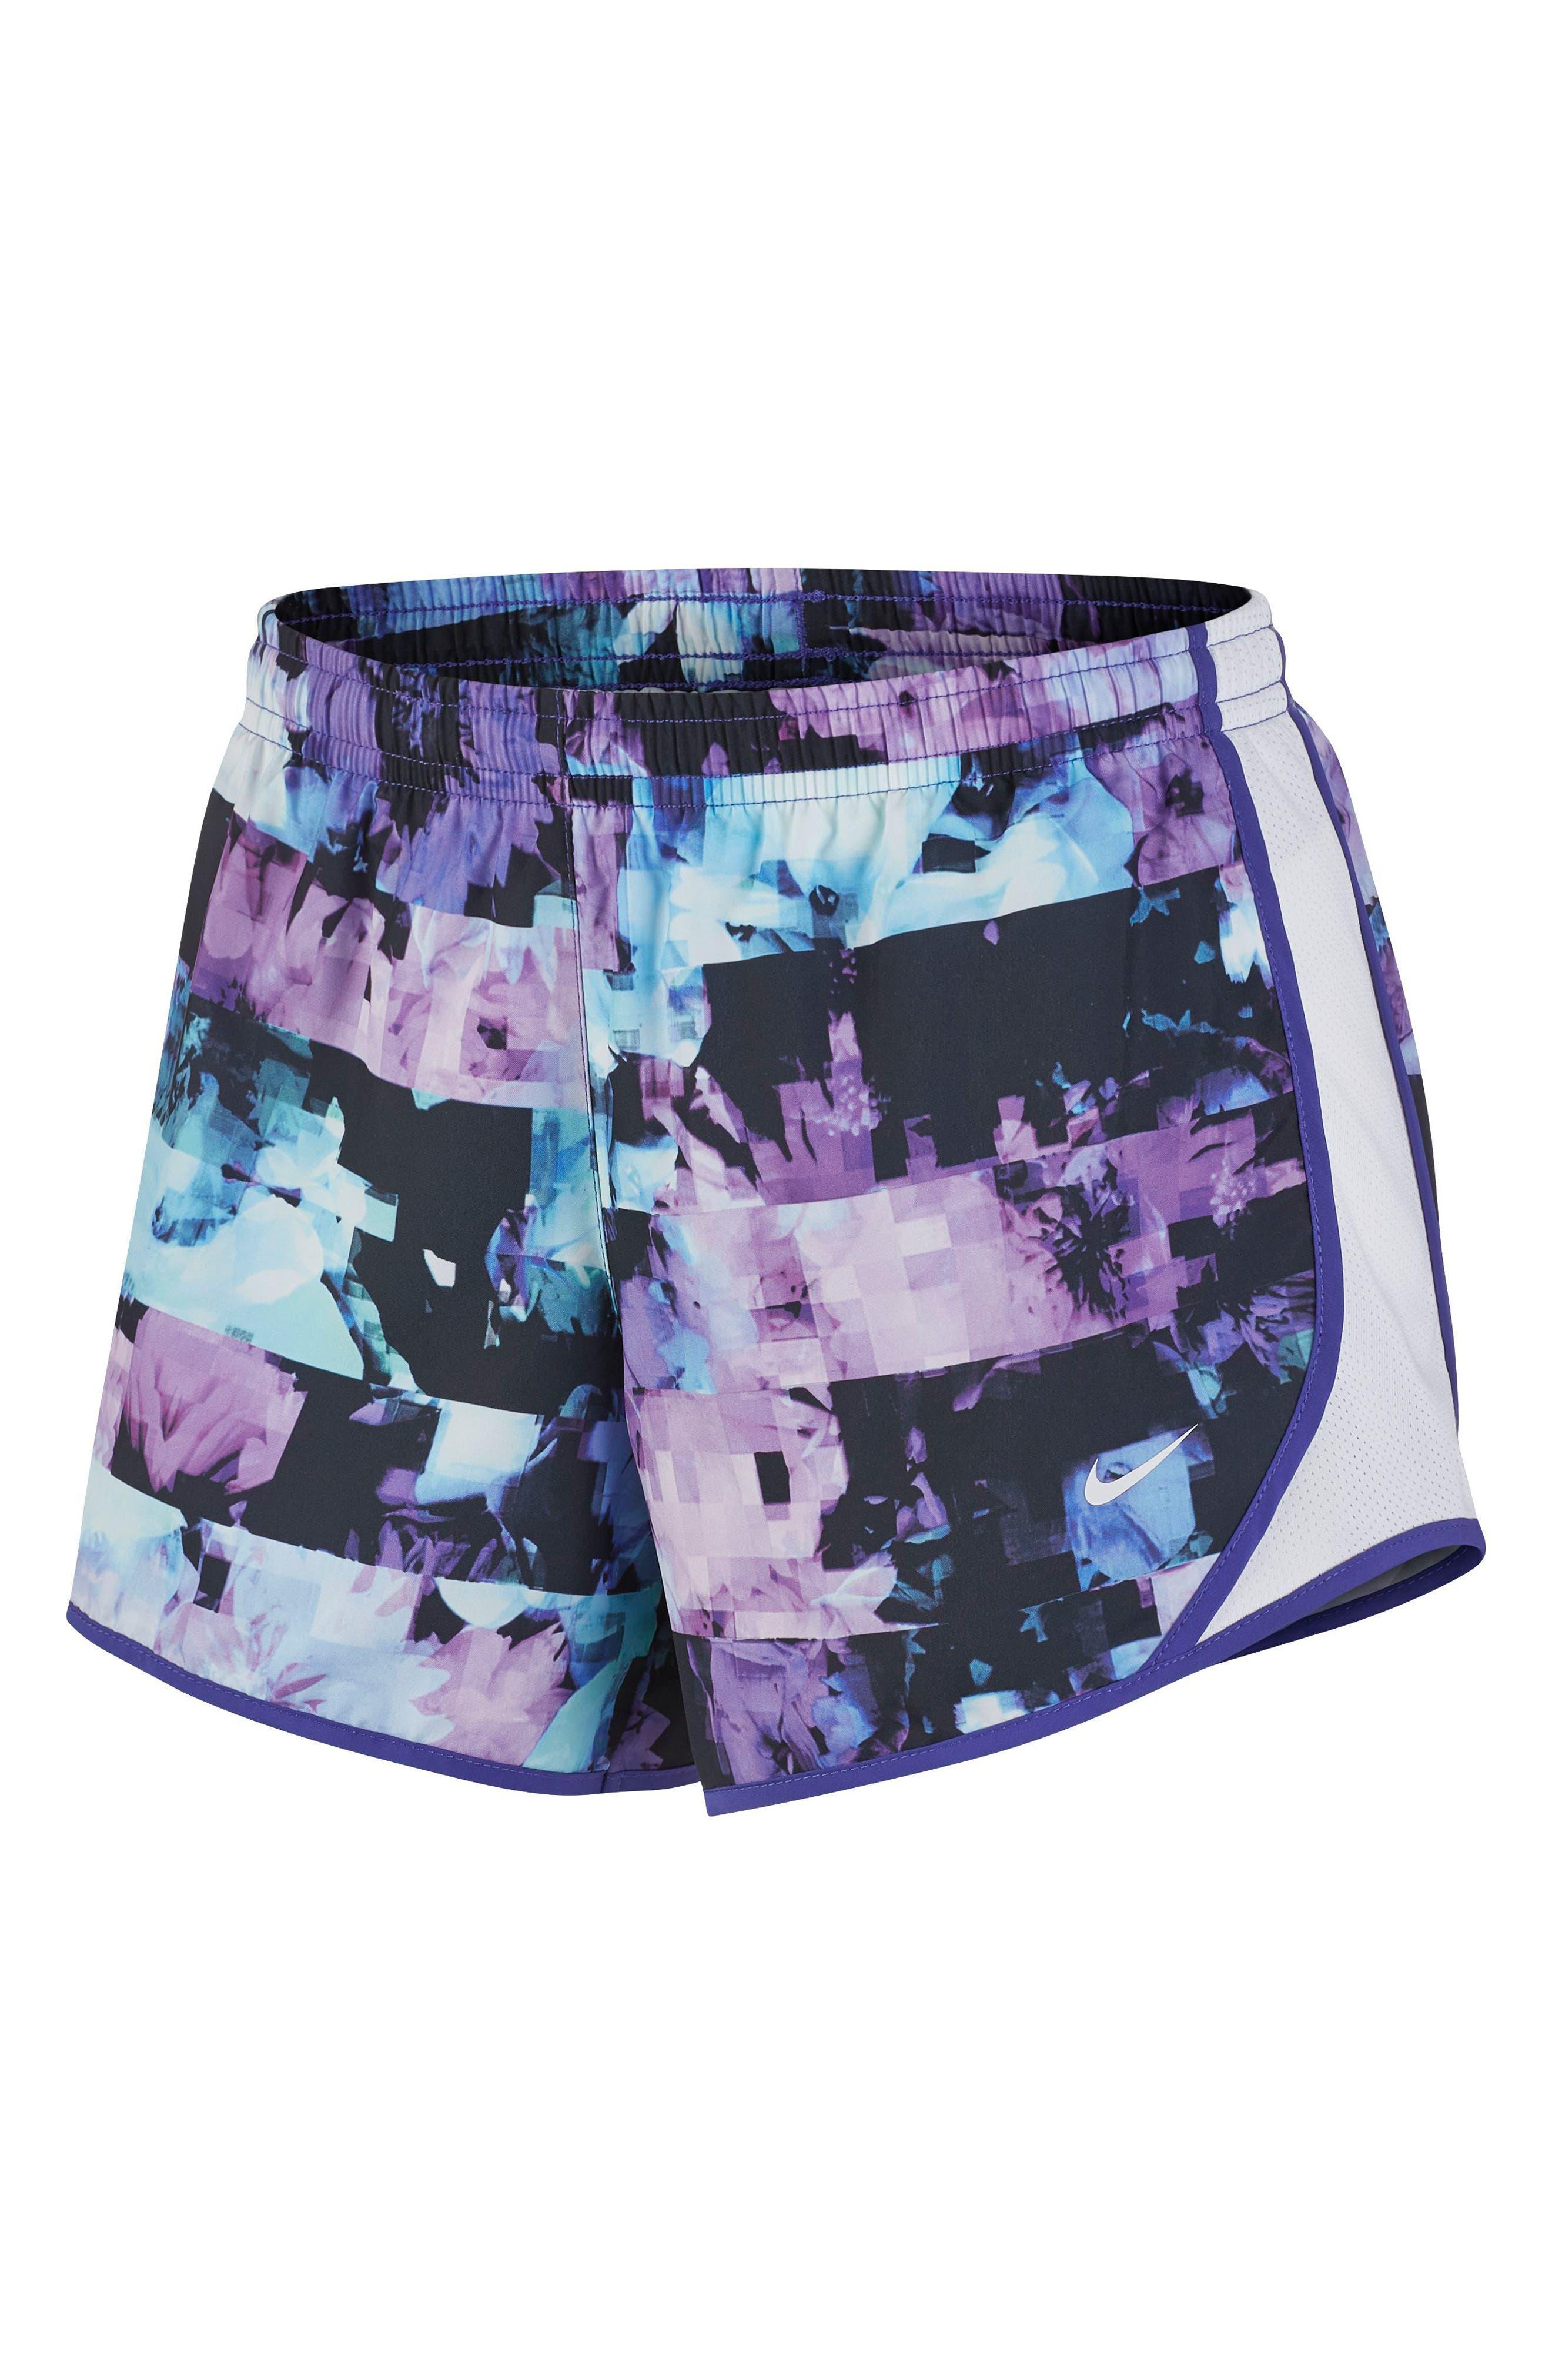 Tempo Dri-FIT Running Shorts,                         Main,                         color, Persian Violet/ White